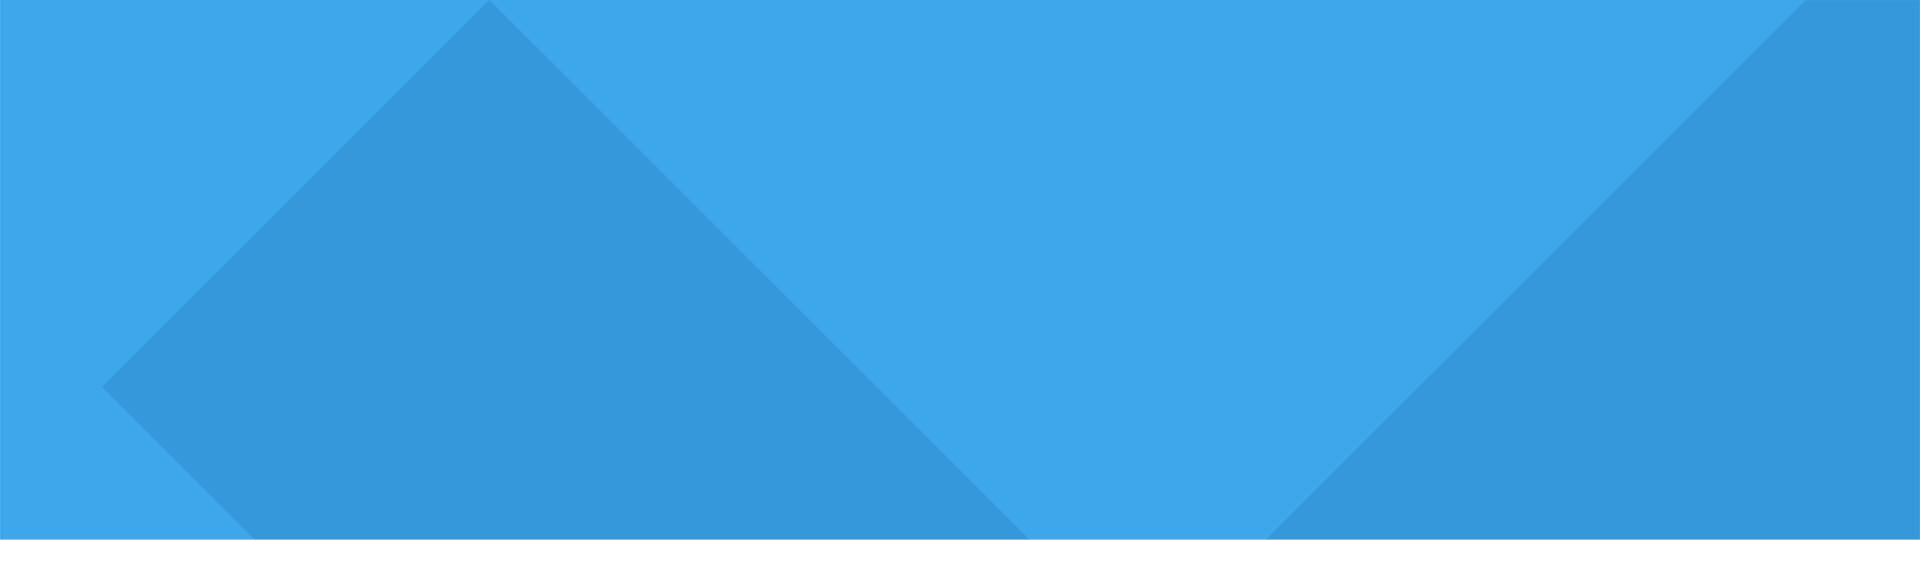 3d Wallpaper Android Parallax Simplicity Premim Wordpress Theme